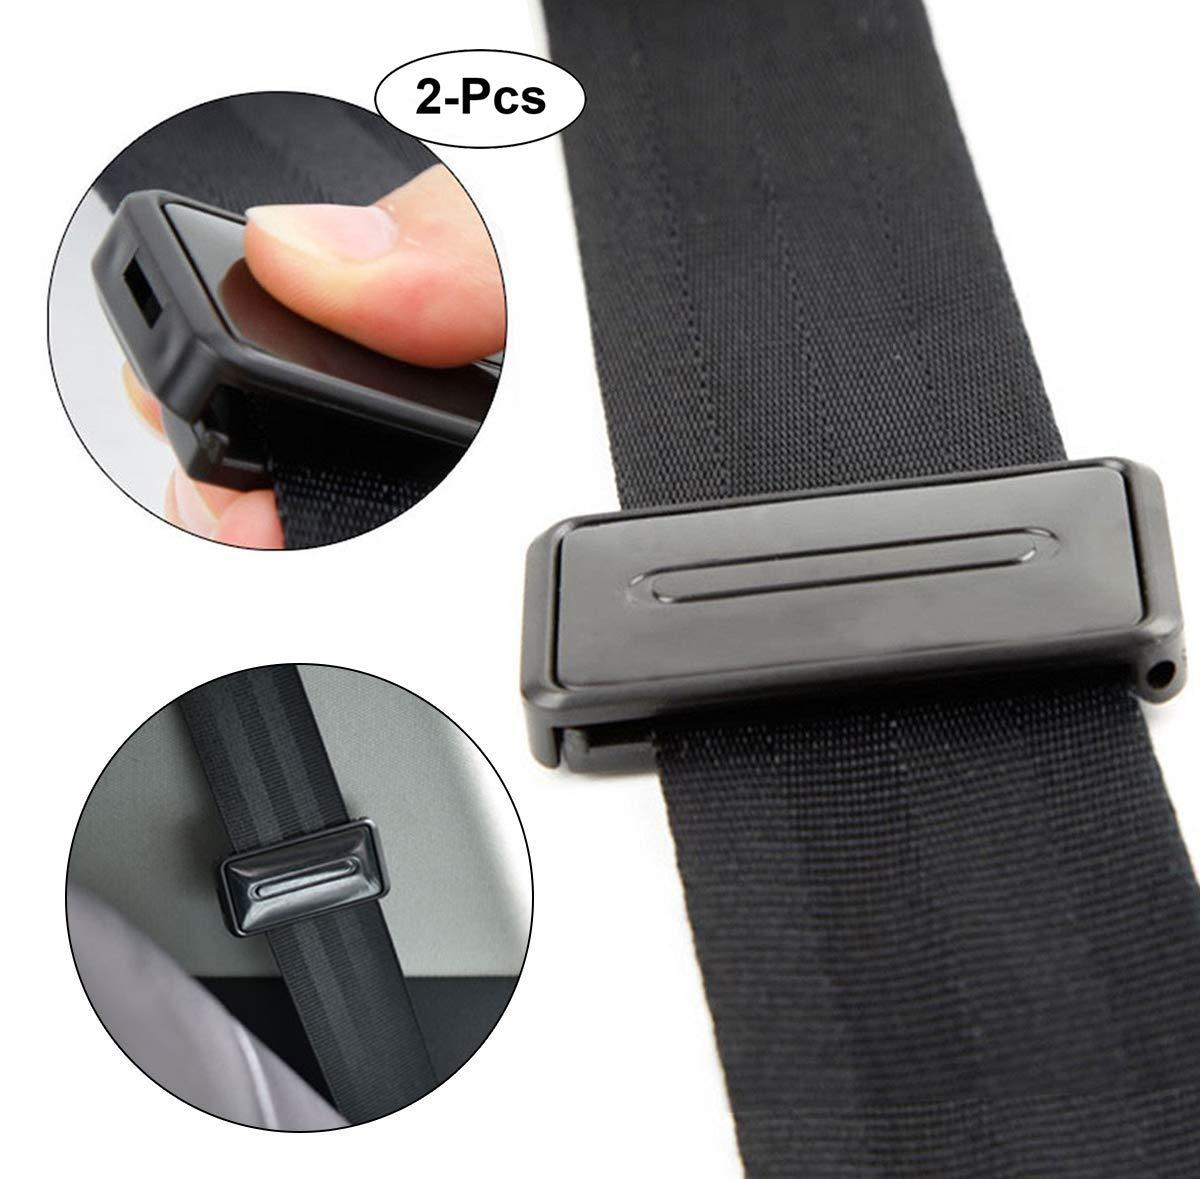 Car Seat Belt Adjuster, Seatbelt Clips | Smart Adjust Seat Belts to Relax Shoulder Neck Give You a Comfortable and Safe Experience | 2PCS Black